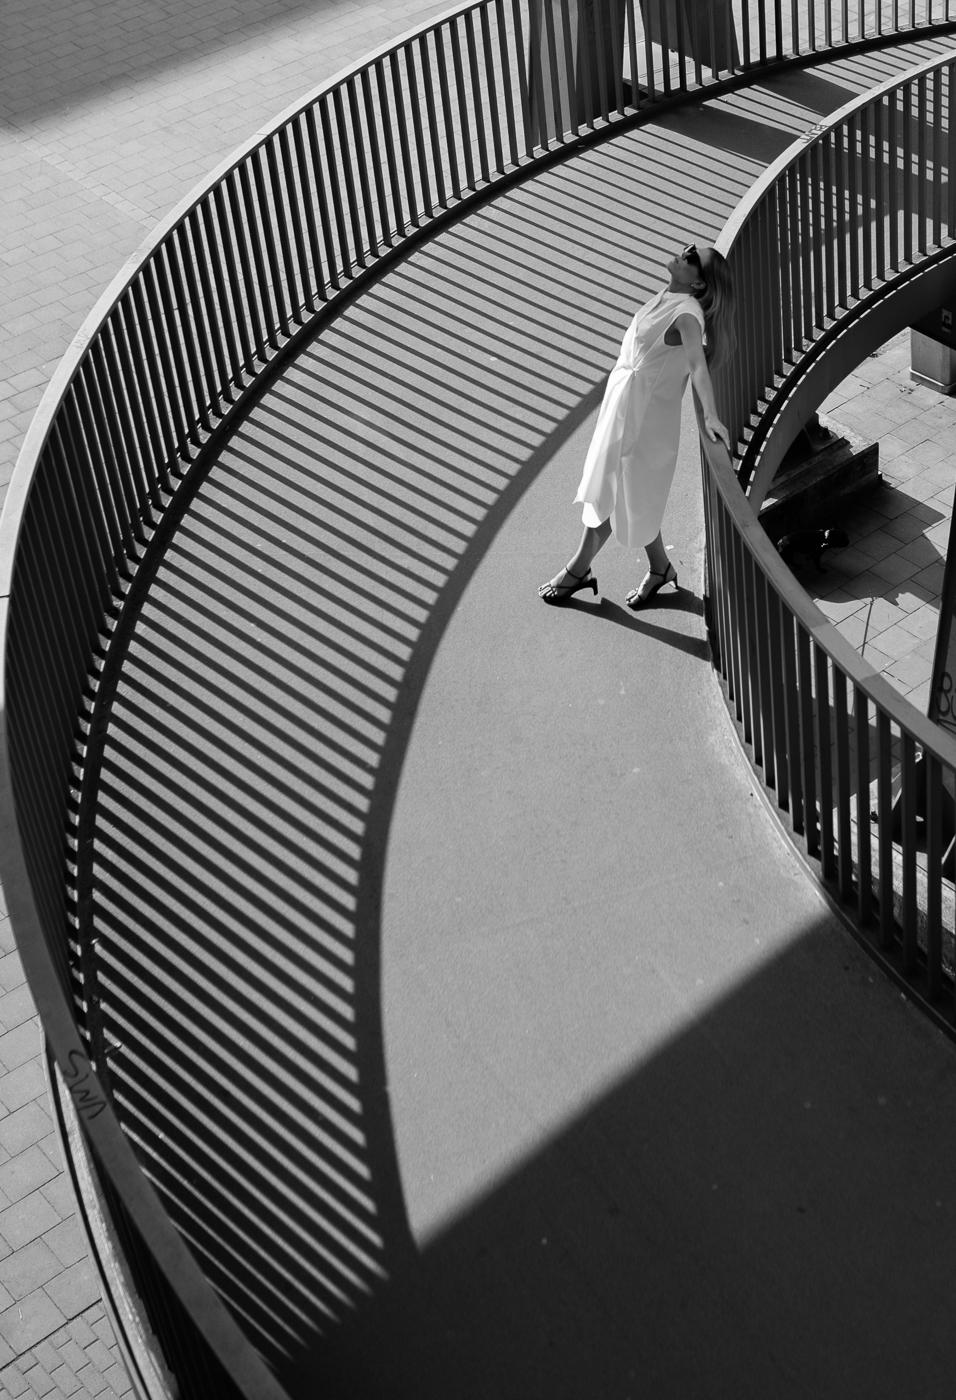 Cos-kleid-sandals-white-dress-8-1